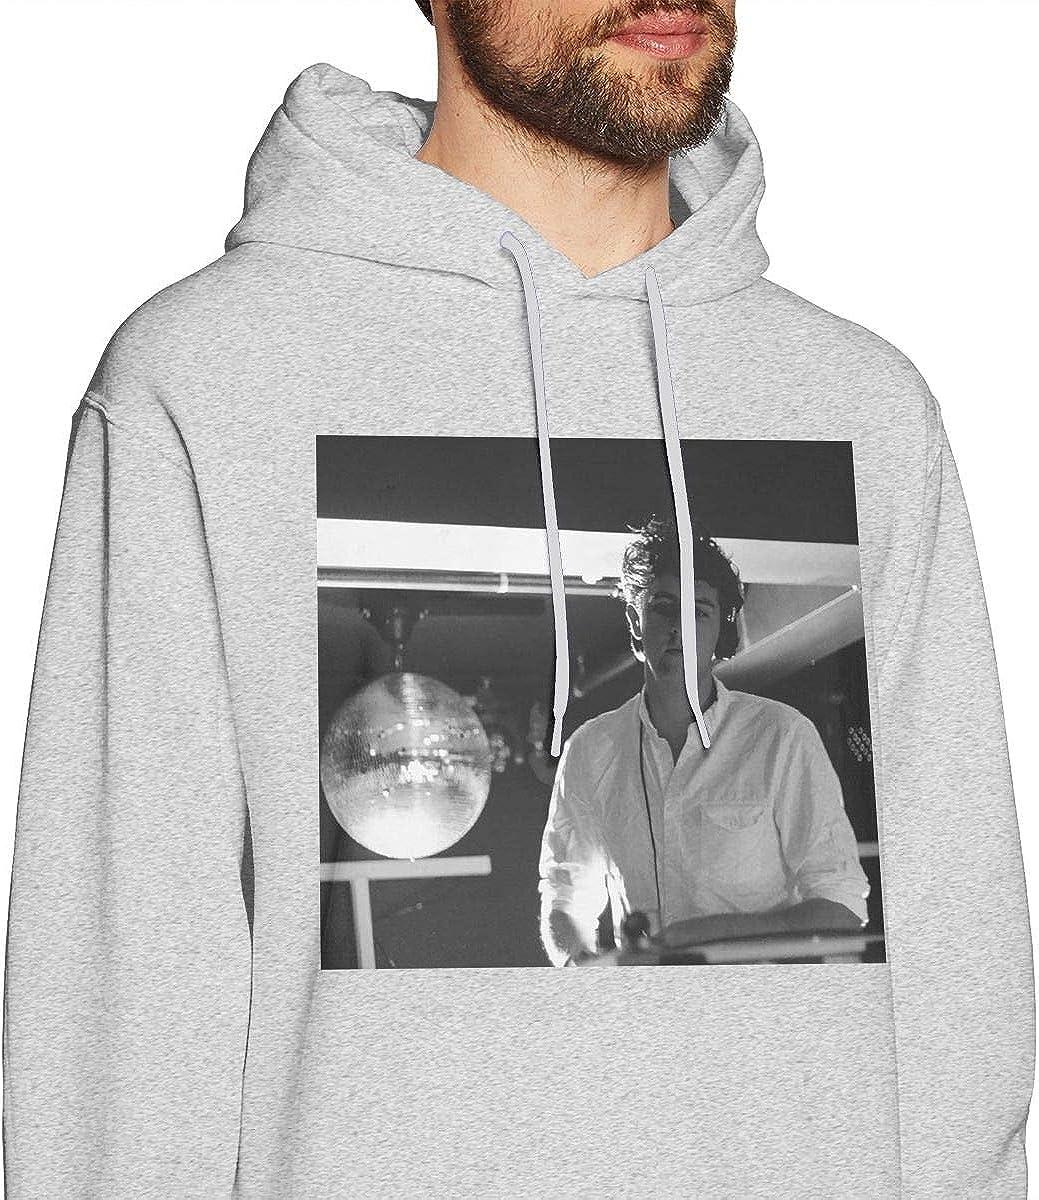 QINQIN The Xx-Idontknow Fashion Mens Hat and Pocketless Sweater Black